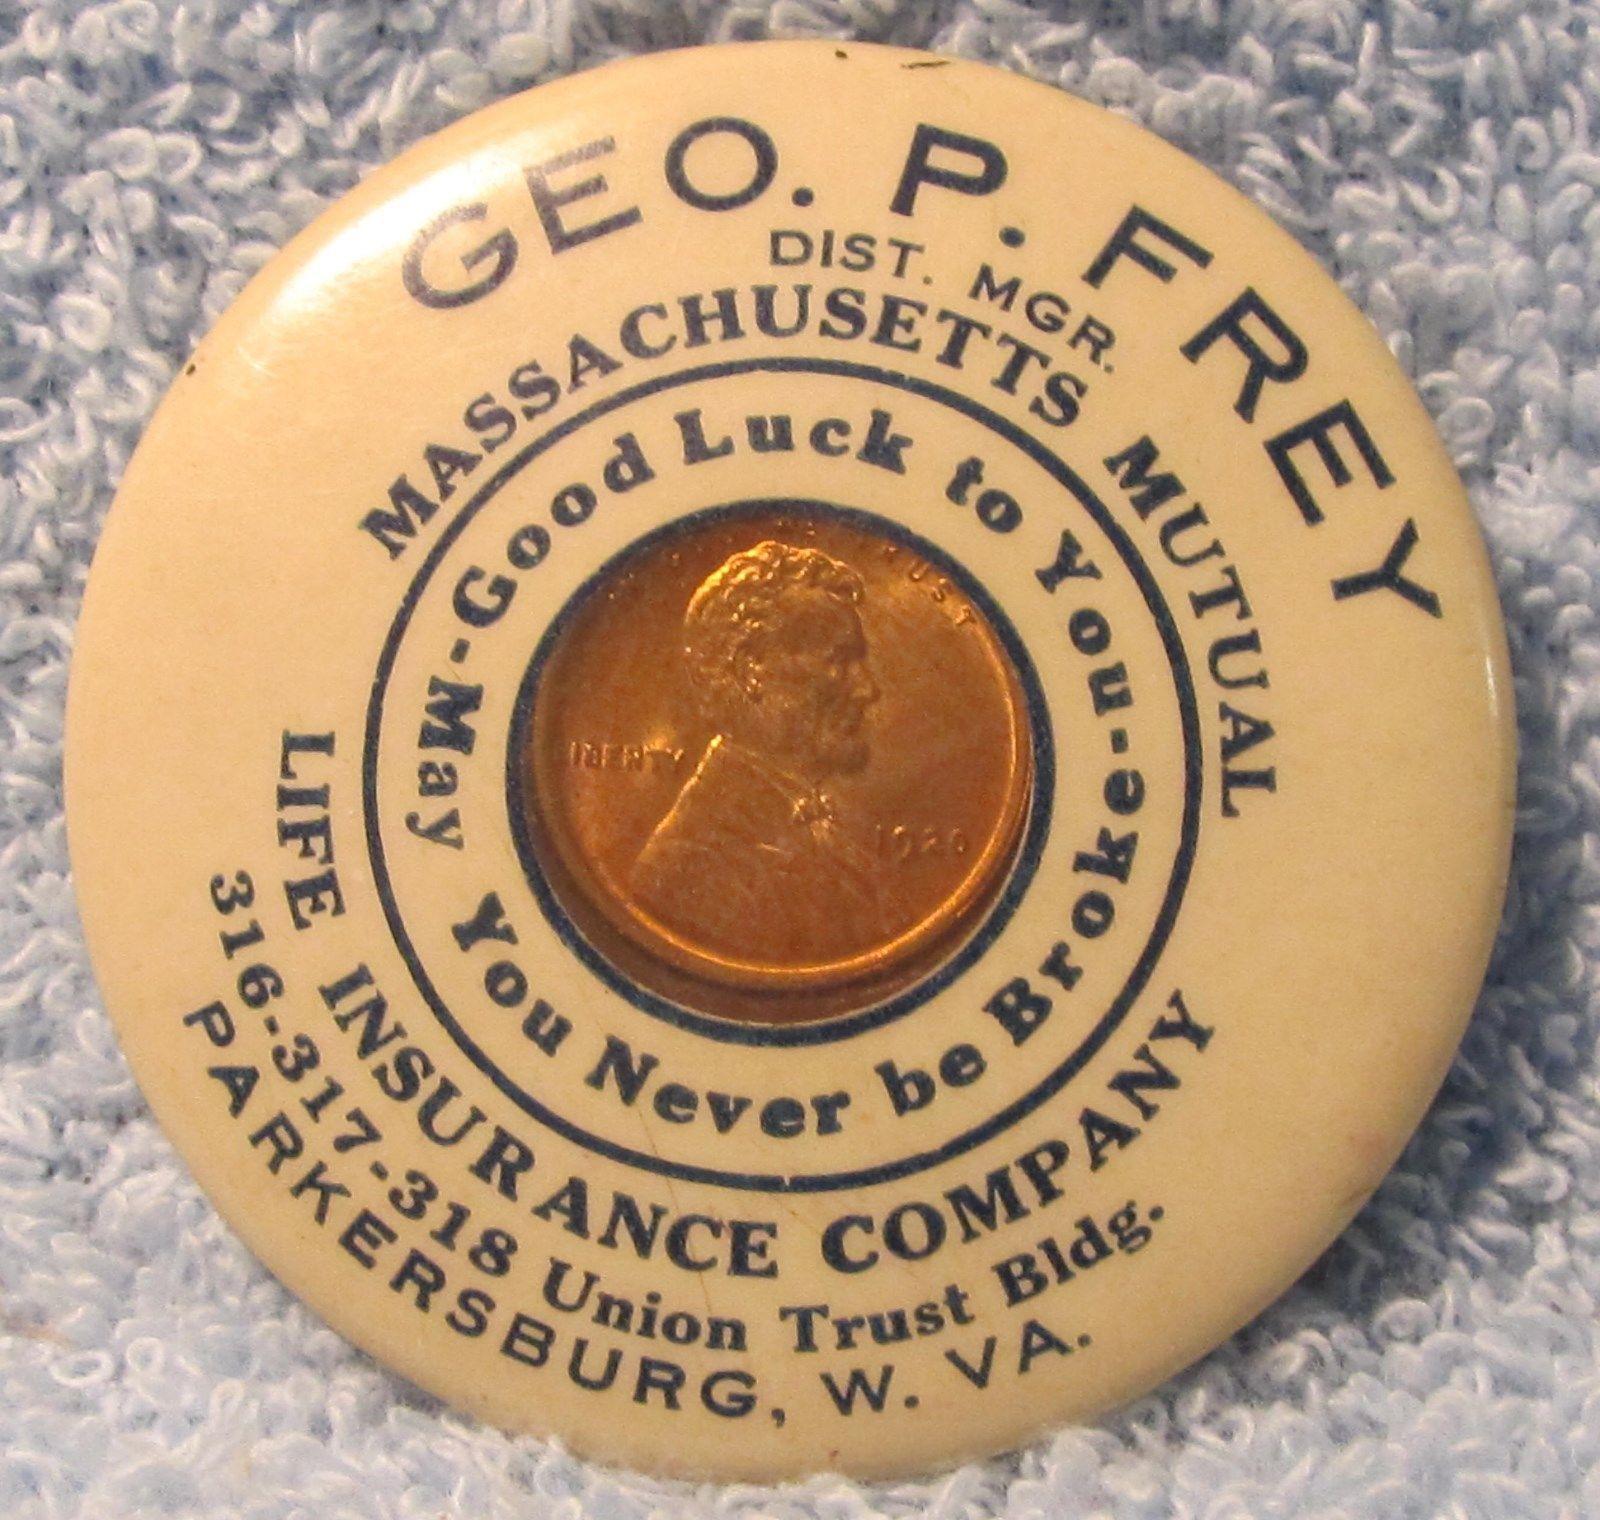 Parkersburg Wv Geo P Frey Dist Mgr Massachusetts Mutual Life Insurance Company 316 317 Parkersburg Life Insurance Companies Mutual Life Insurance